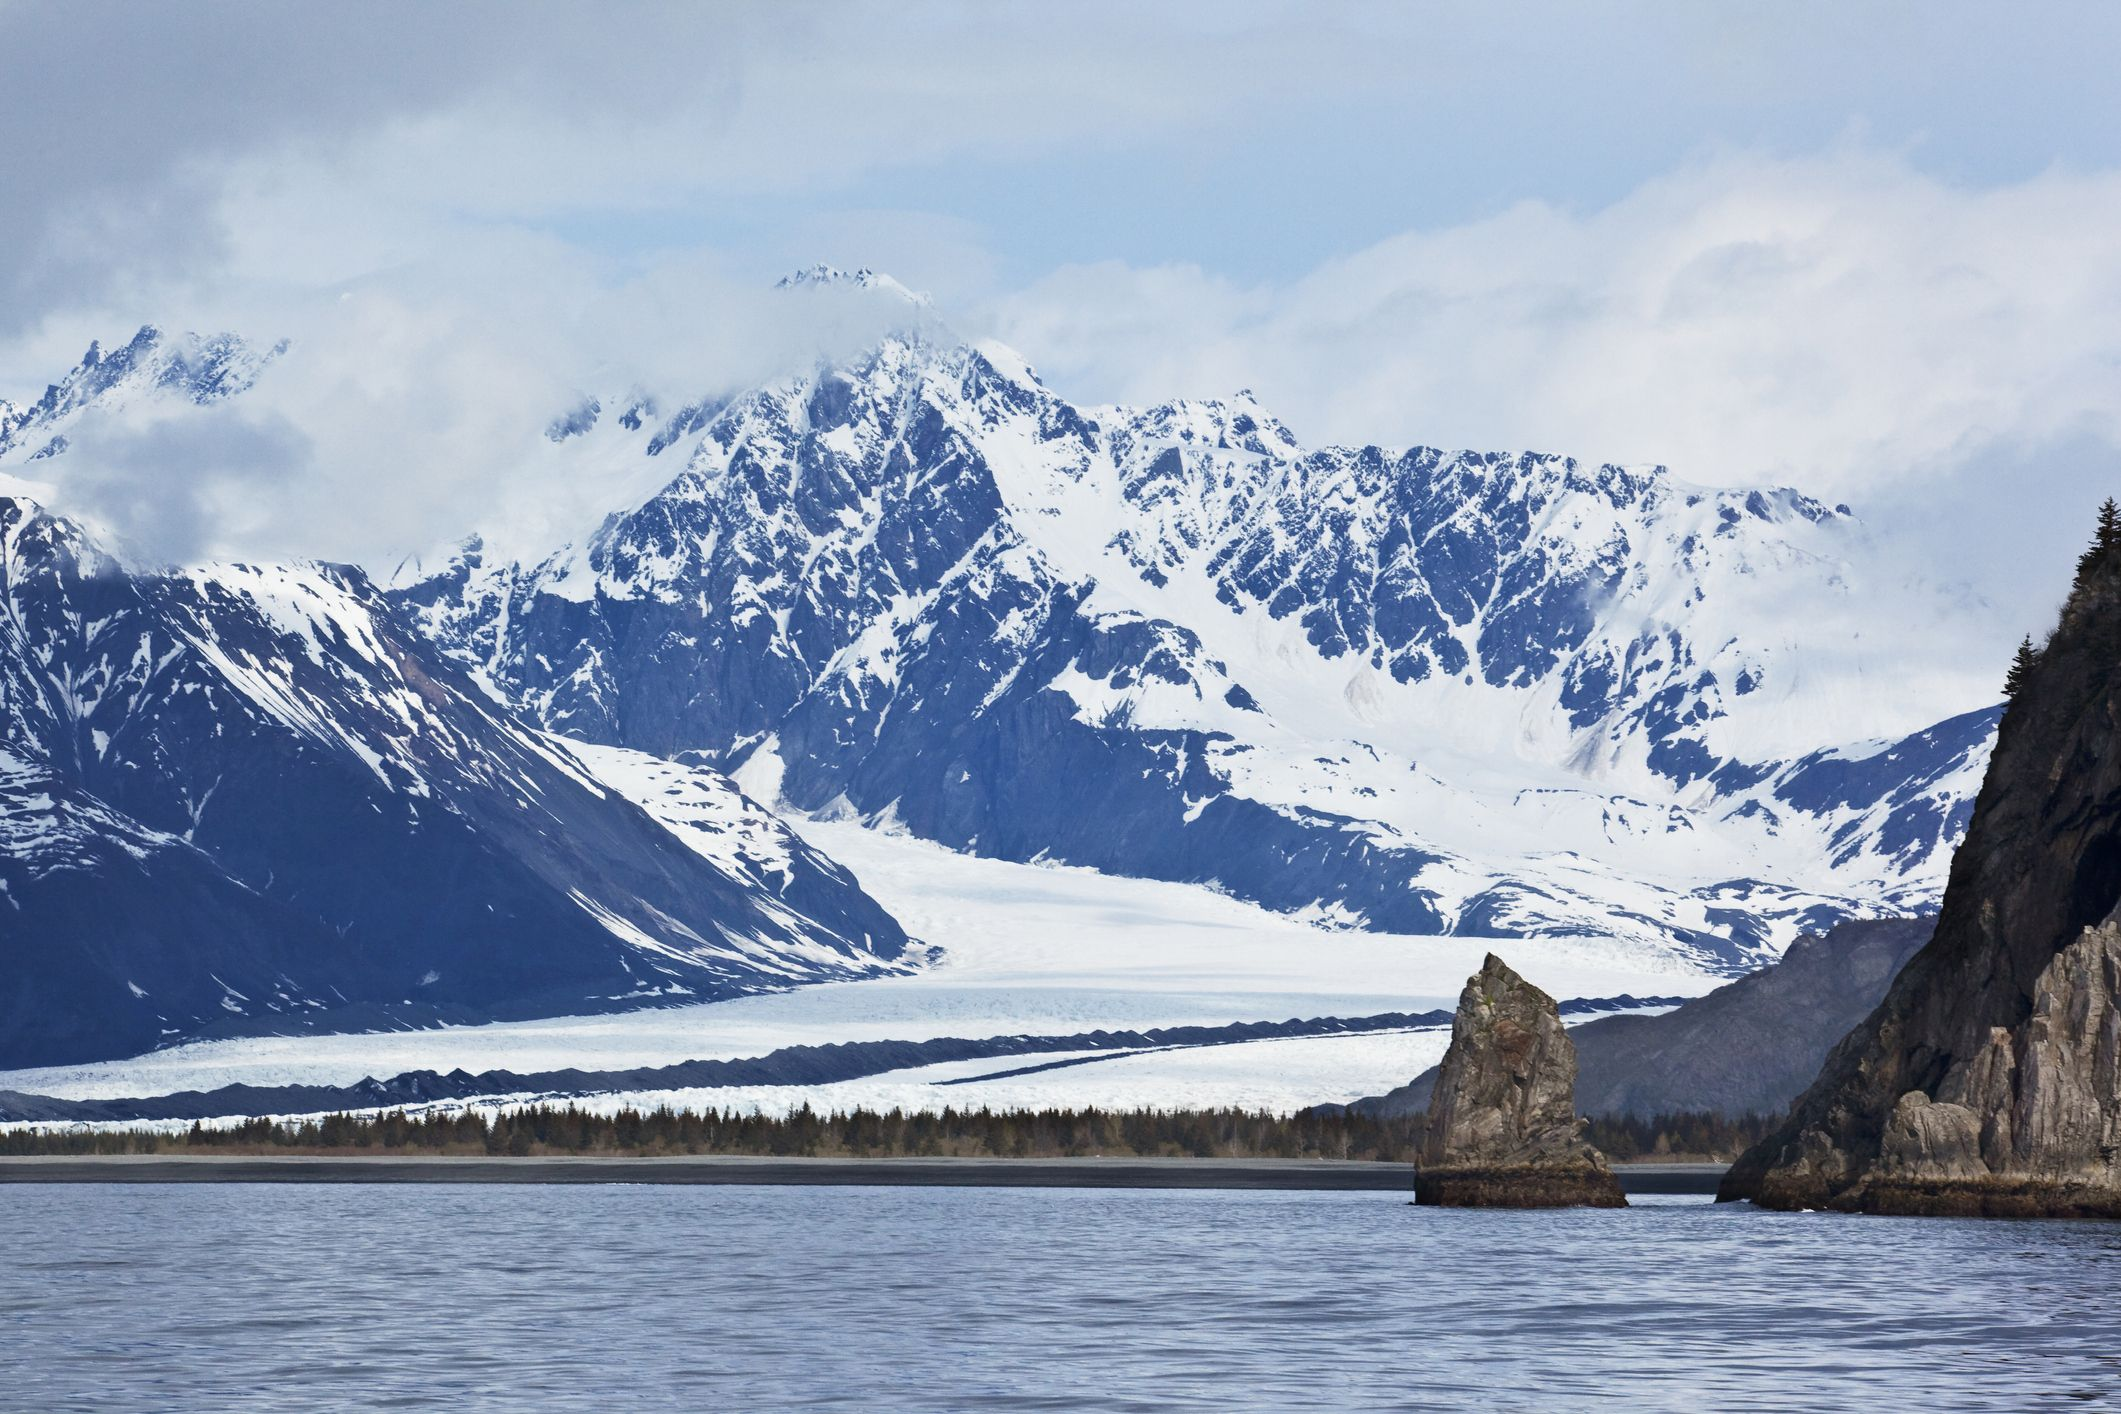 Bear Glacier in Kenai Fjords National Park as seen from Resurrection Bay near Seward, Alaska, U.s.a.